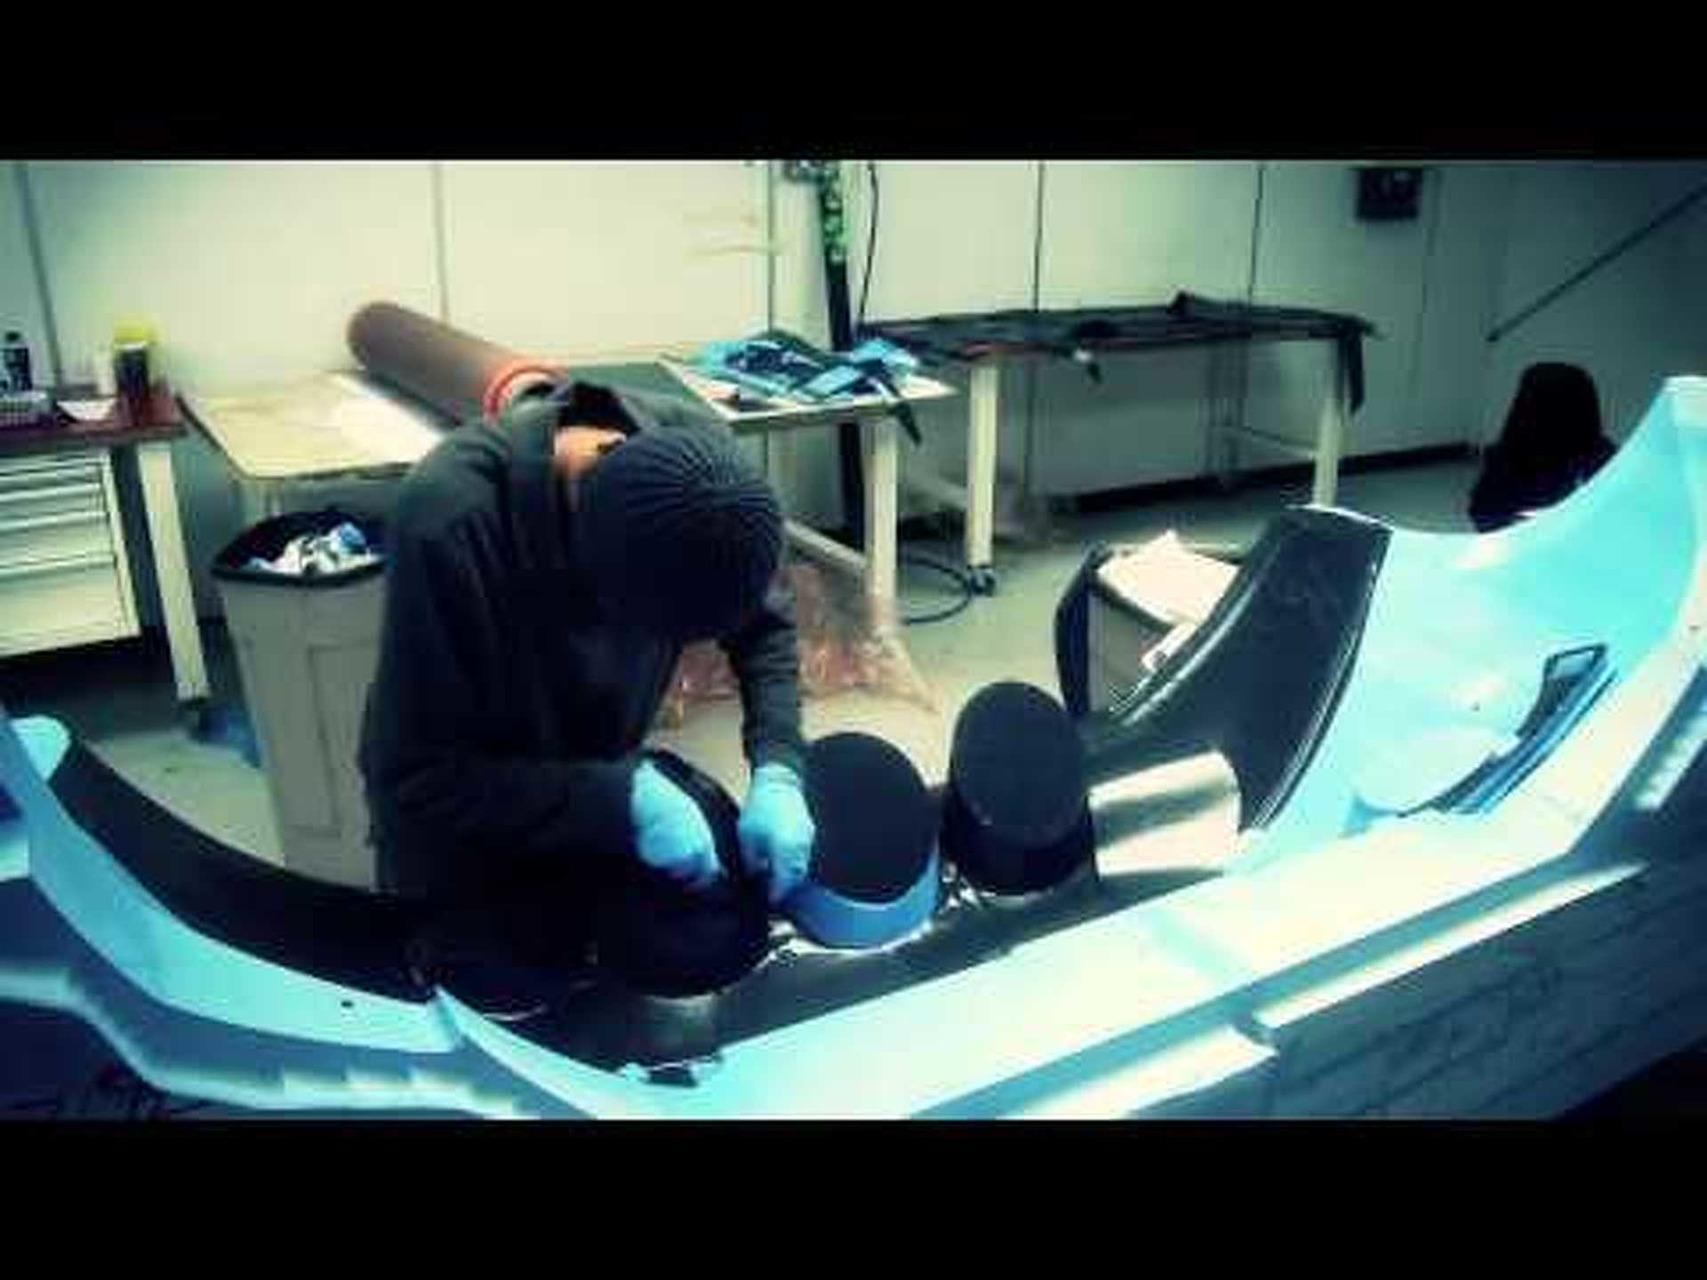 2011 Nissan Juke-R Concept - Body Styling